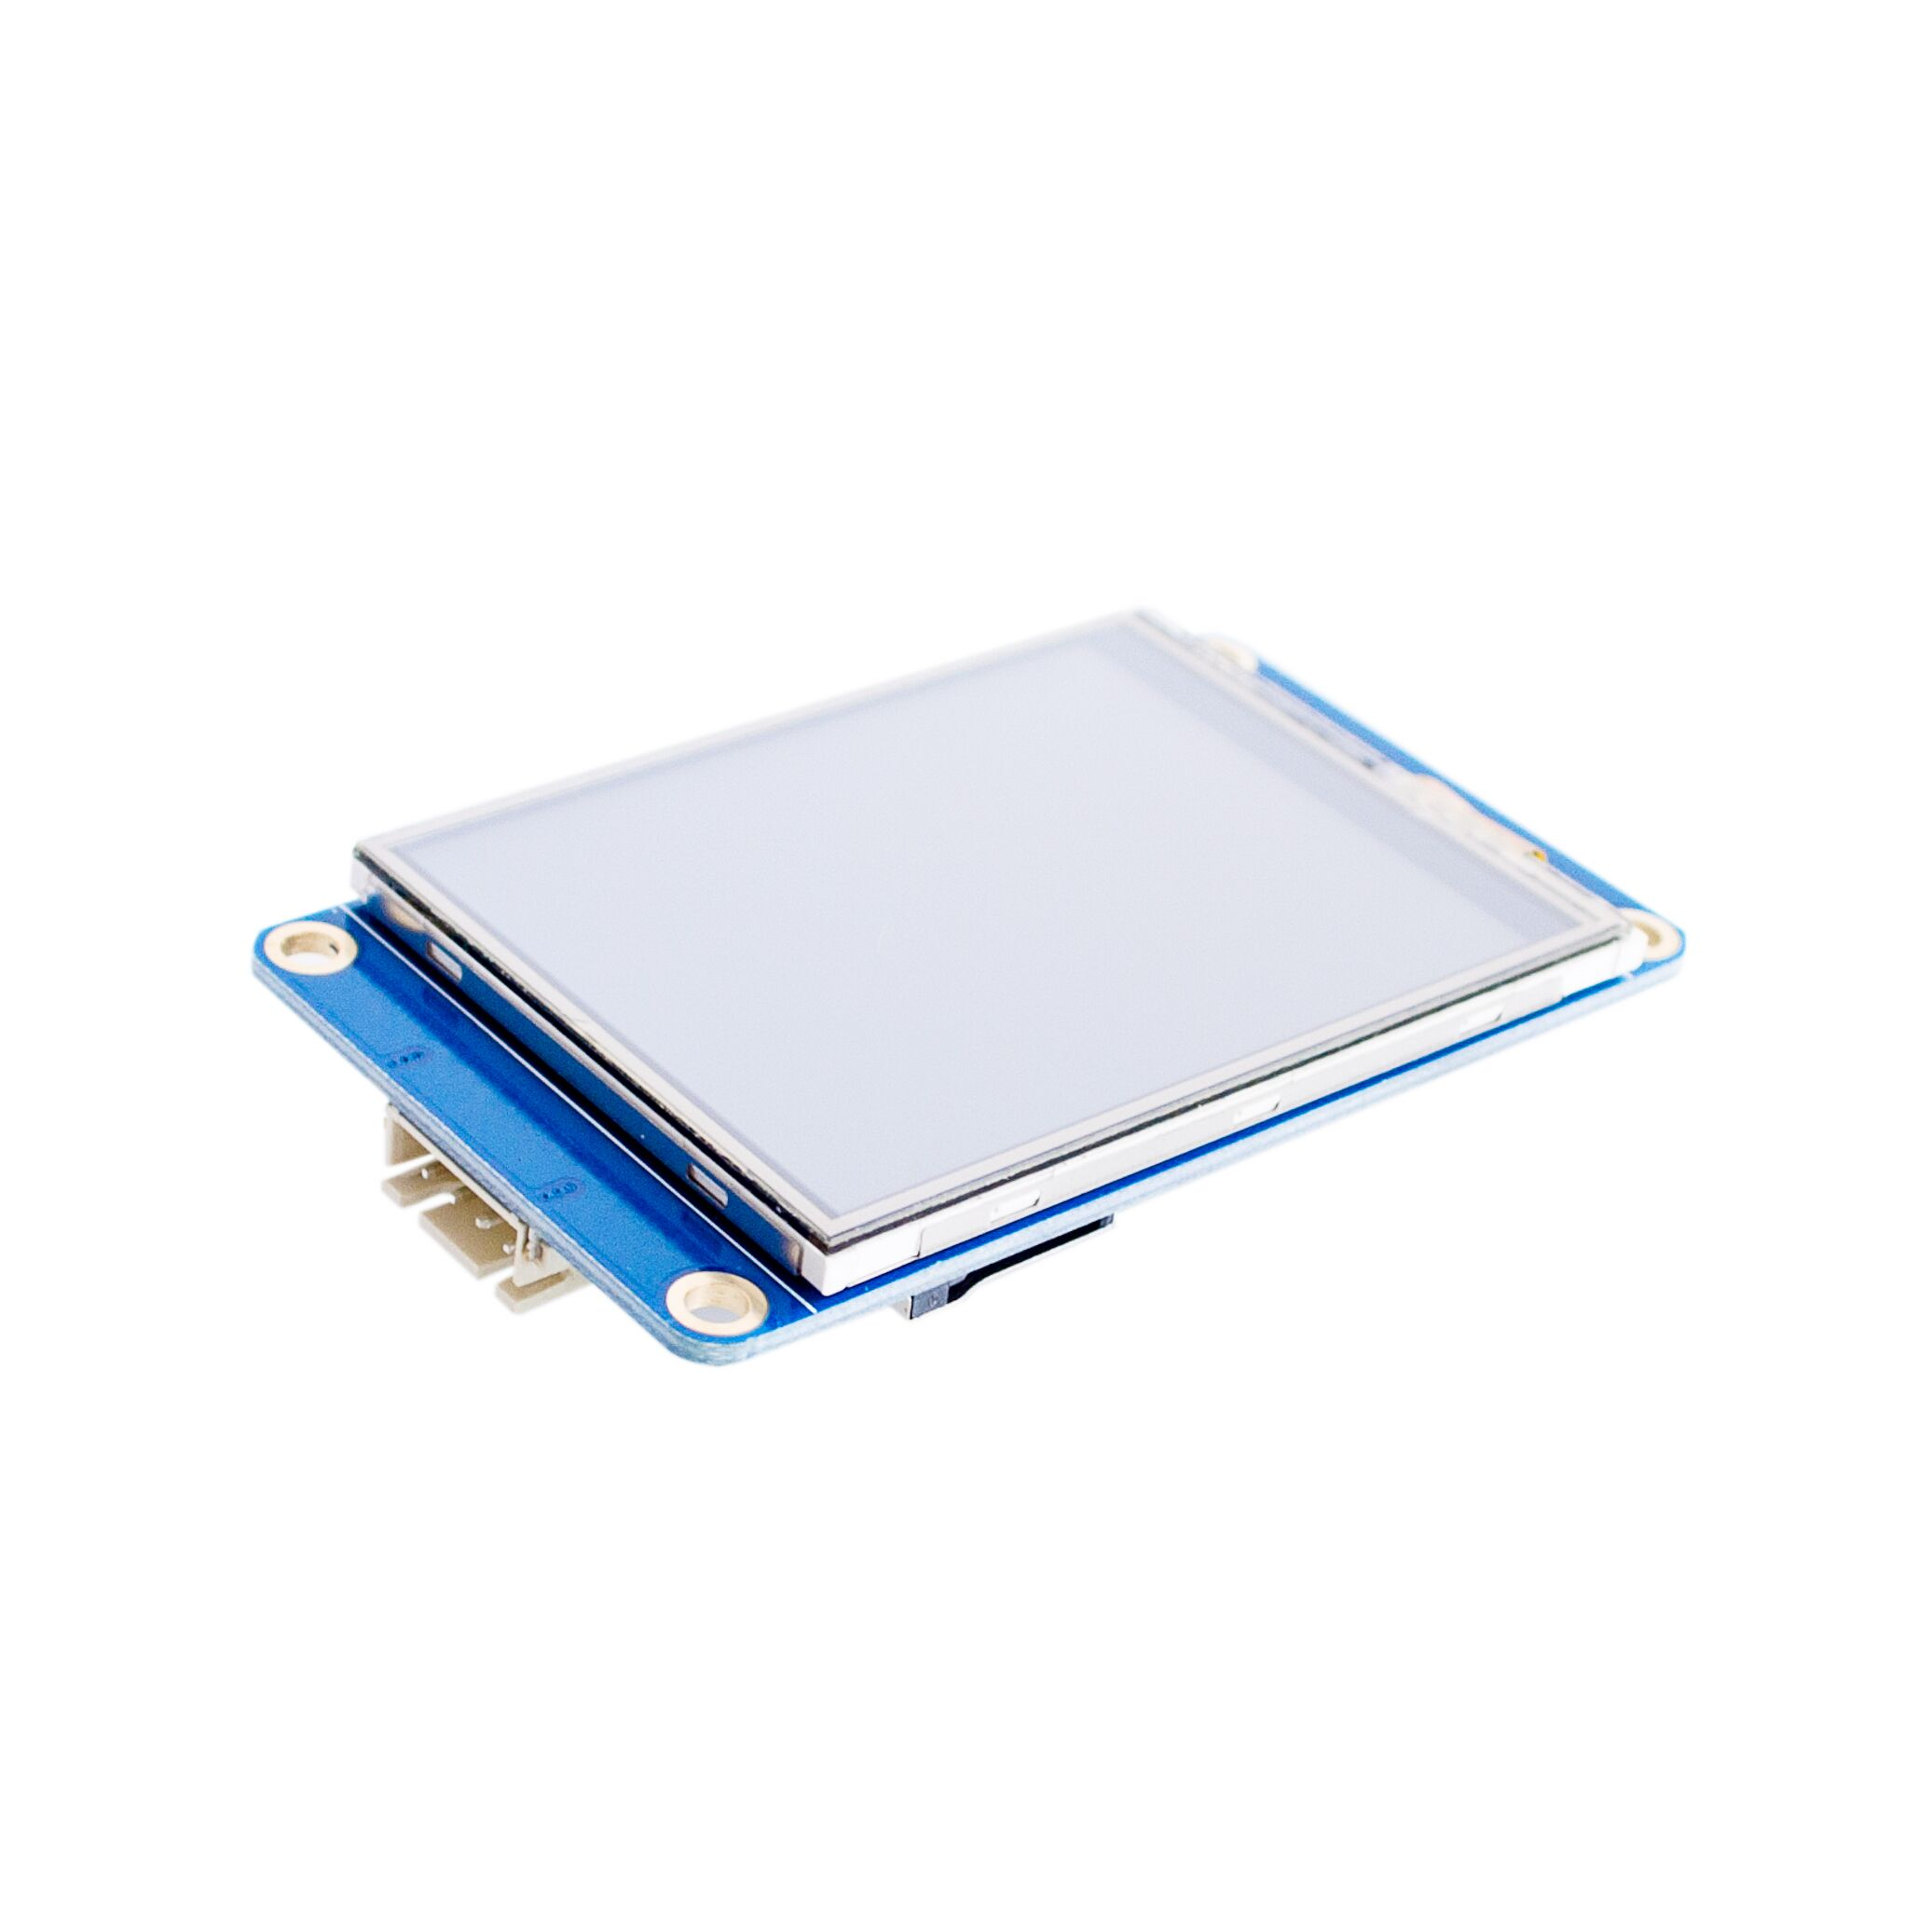 "Image 2 - Nextion 2.4"" TFT 320 x 240 resistive touch screen UART HMI Smart raspberry pi LCD Module Display  TFT Englishraspberry piraspberry pi 2nextion tft lcd -"